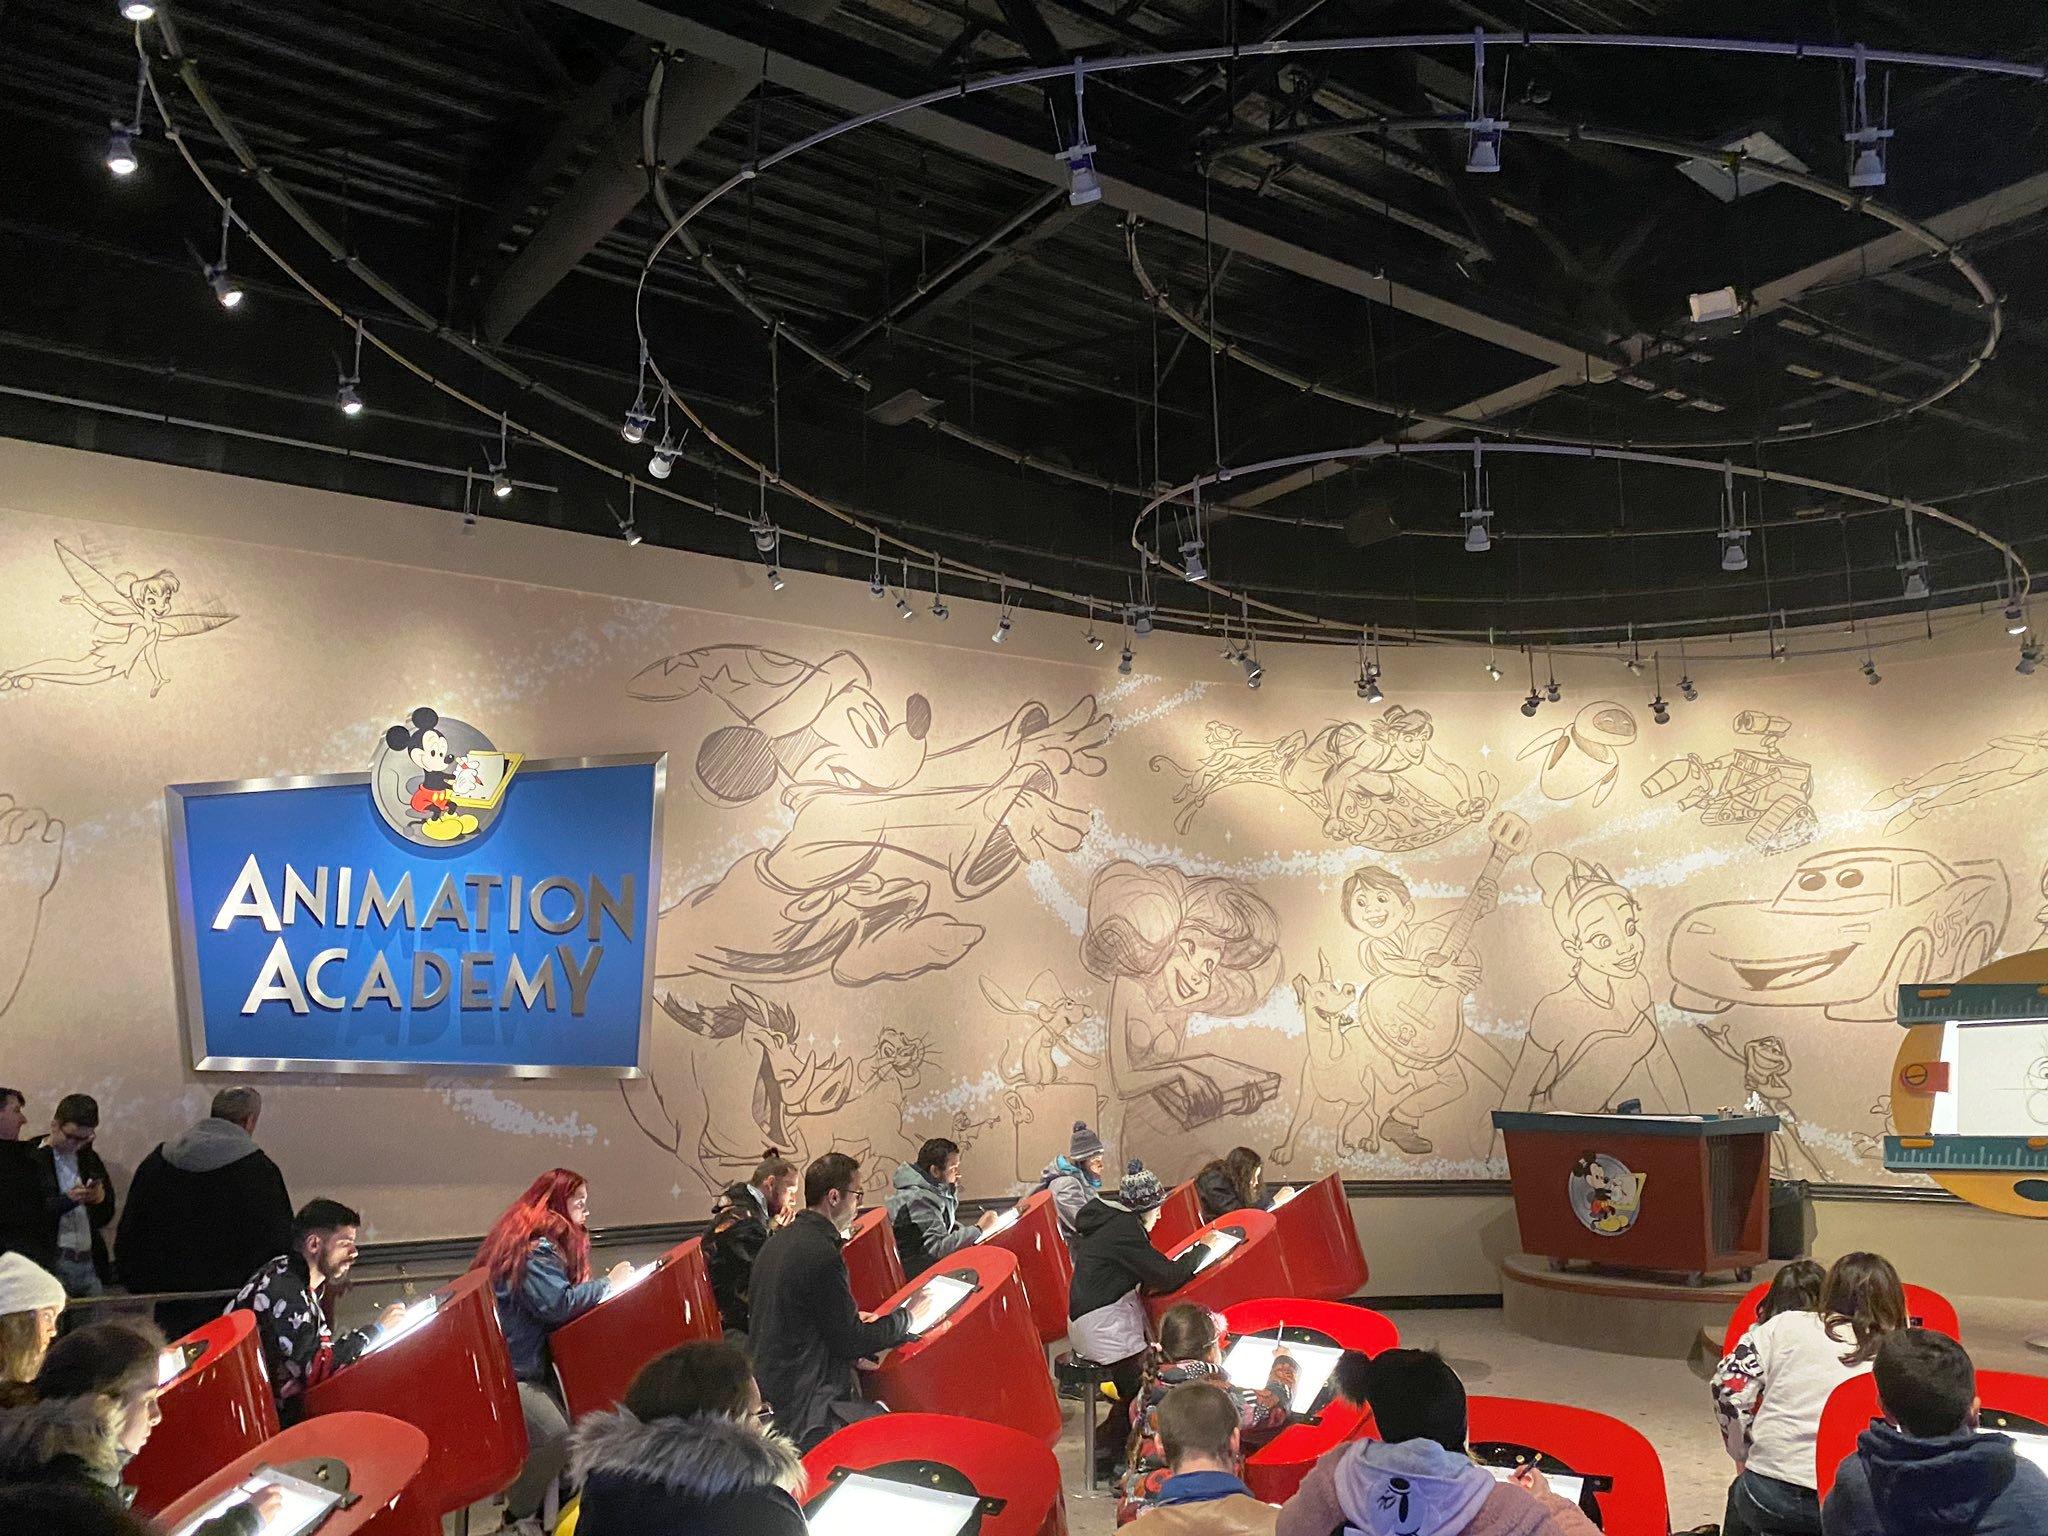 File:Animation Academy Walt Disney Studios Park.jpg